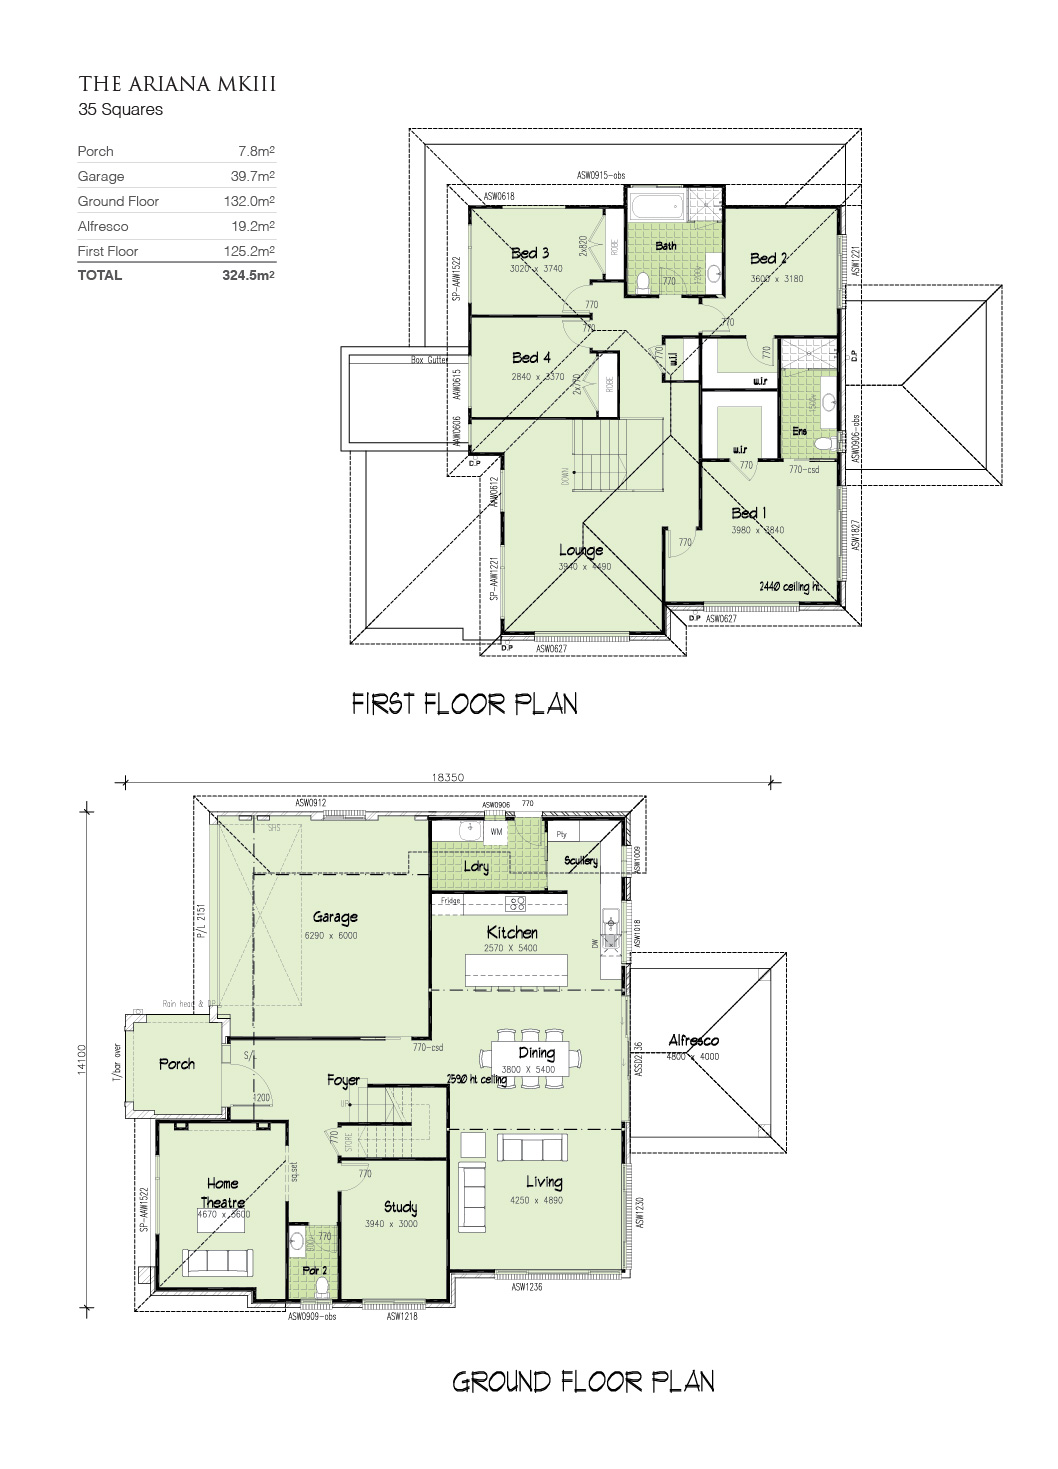 Ariana MKIII, Home Design, Tullipan Homes